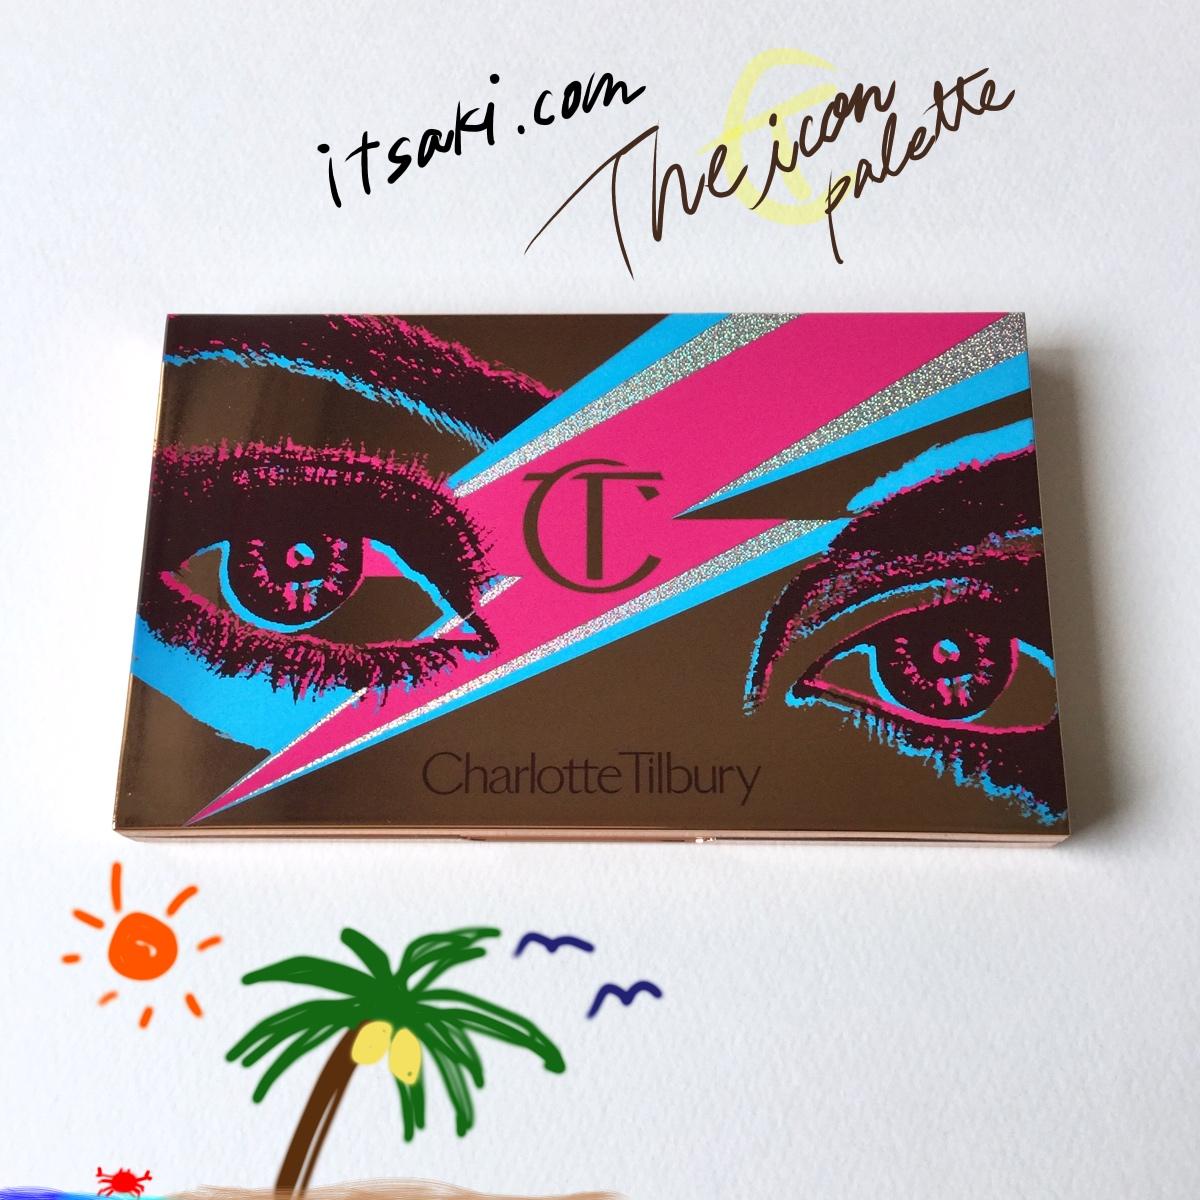 CHARLOTTE TILBURY The Icon Eyeshadow Palette 1